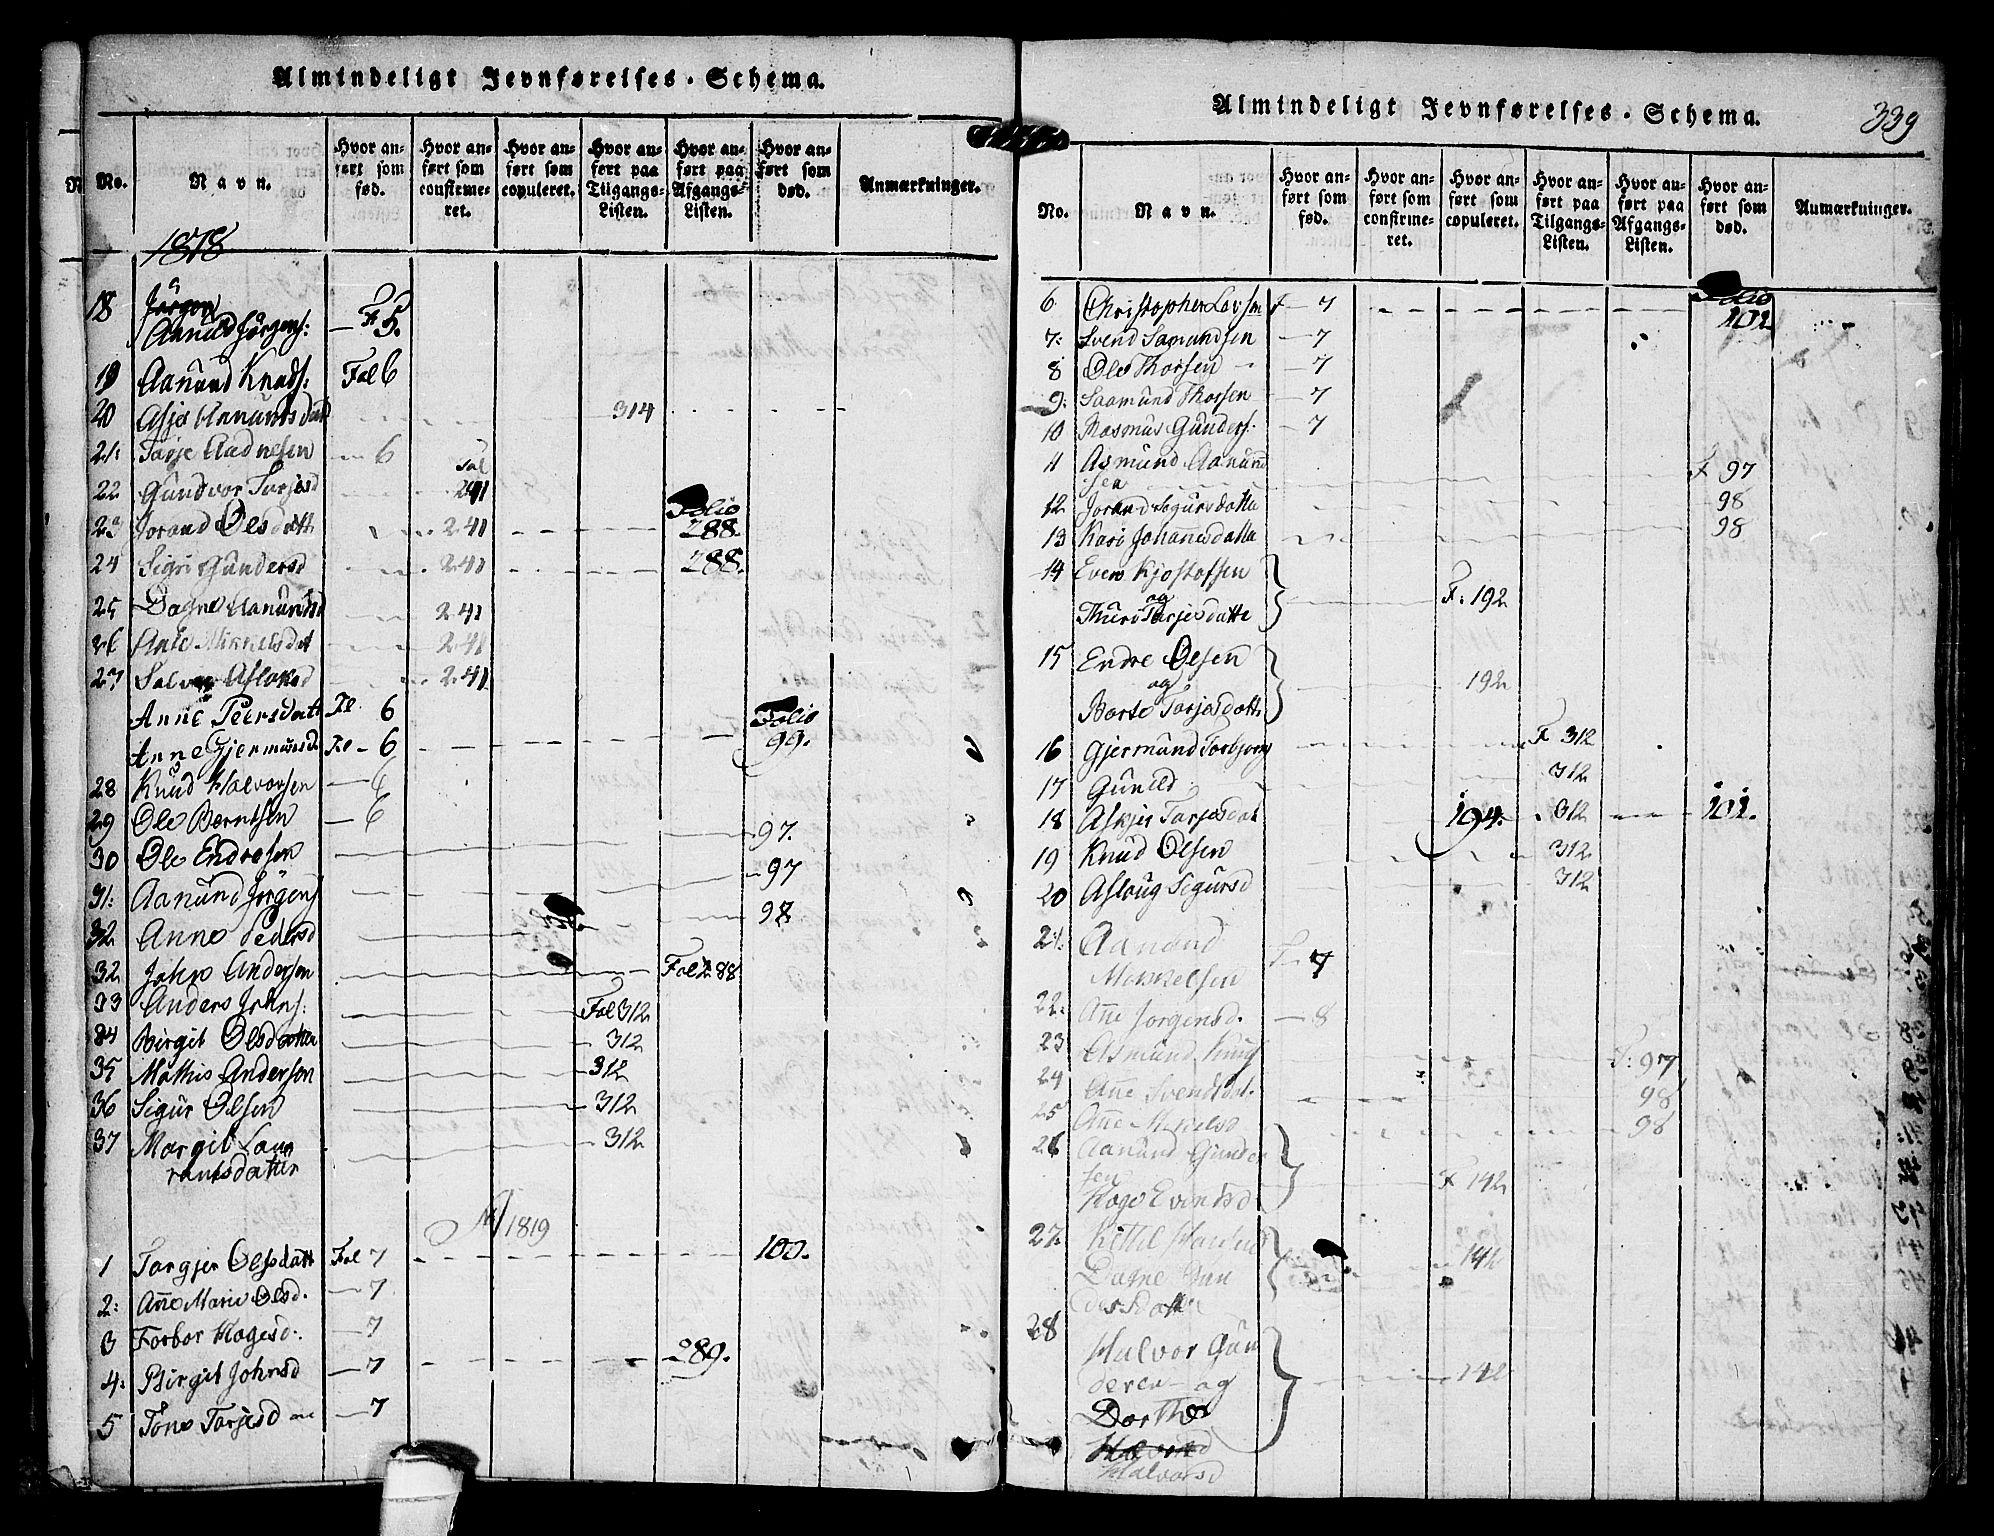 SAKO, Kviteseid kirkebøker, F/Fc/L0001: Ministerialbok nr. III 1, 1815-1836, s. 339